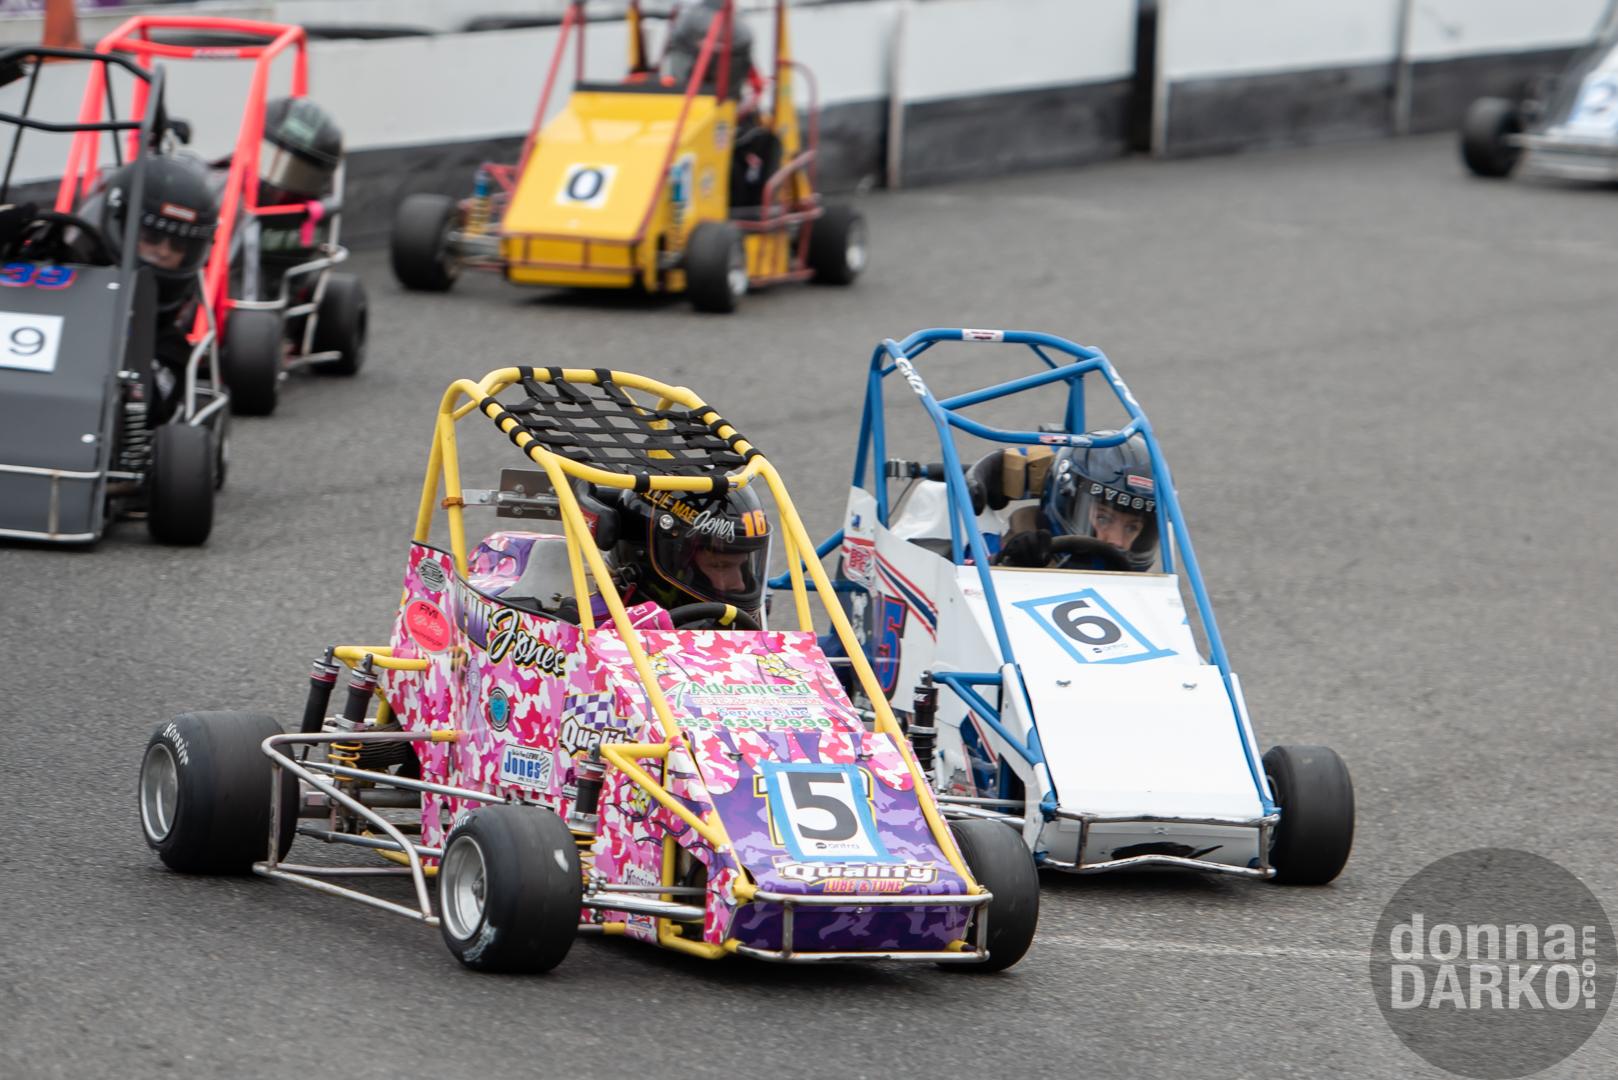 QWMA (Racing) 8-11-2019 DSC_5812.jpg